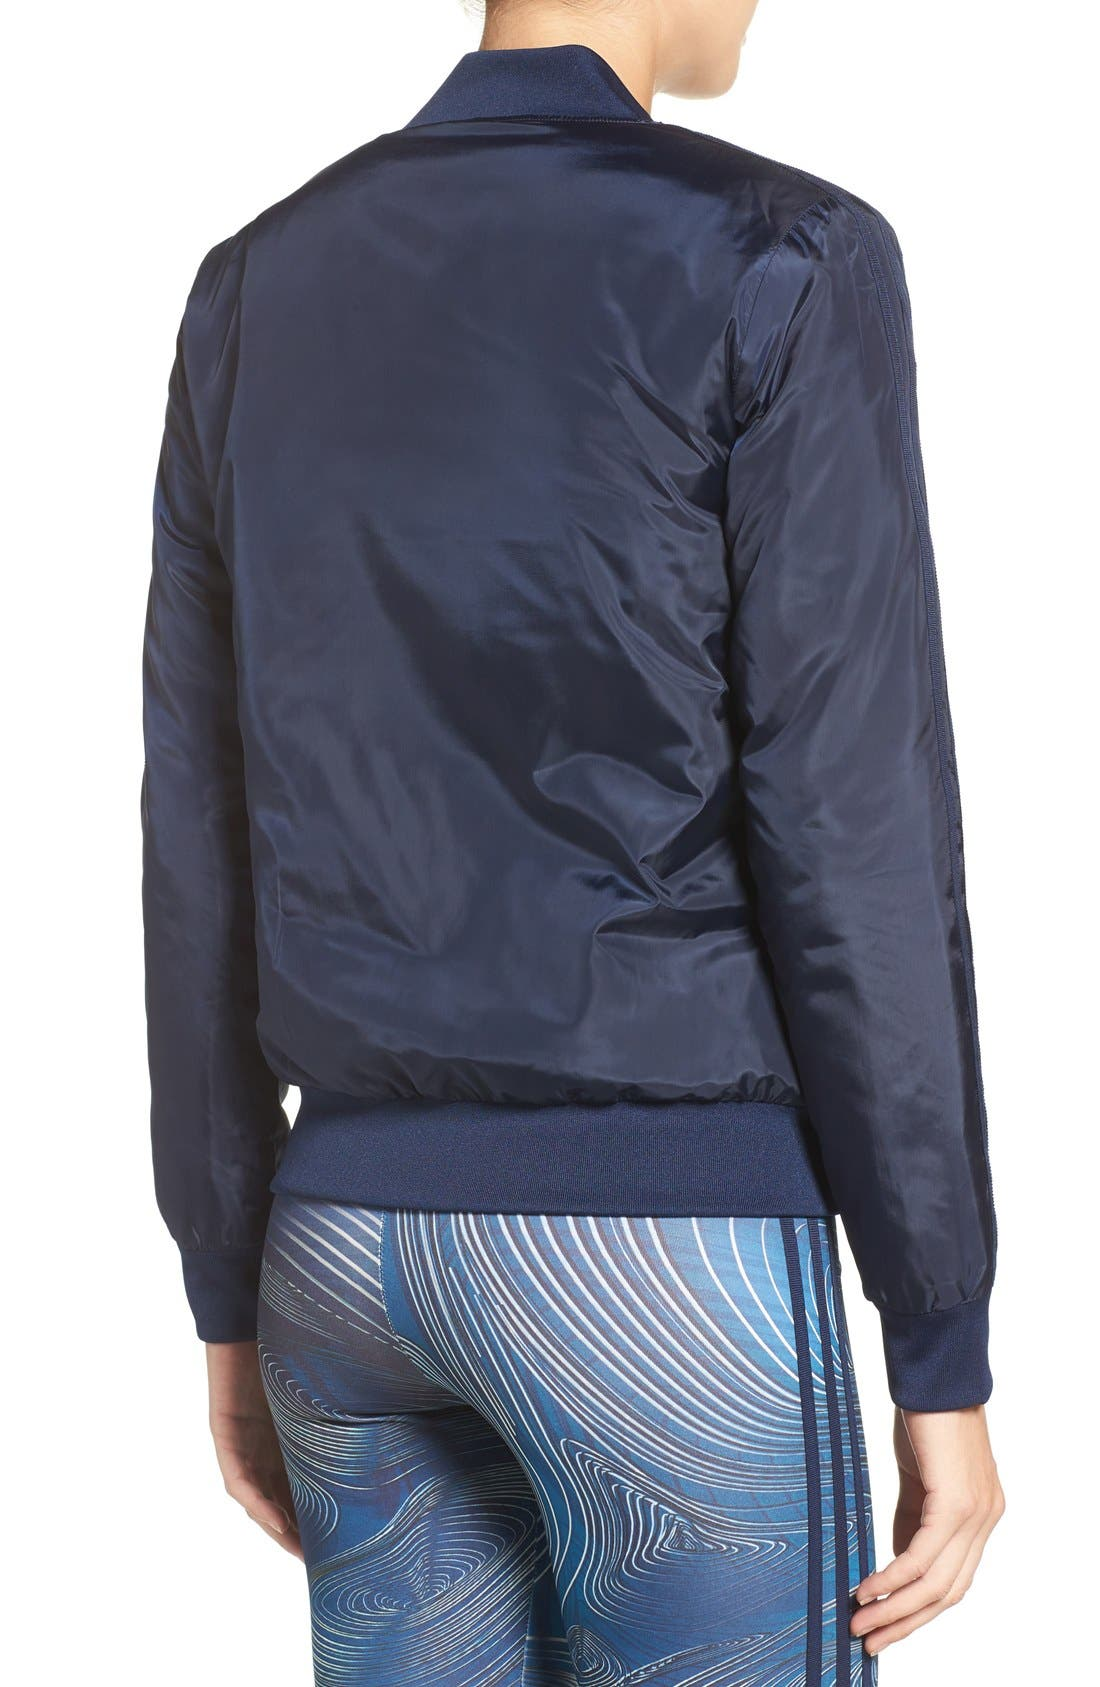 Alternate Image 2  - adidas Originals 'BG' 3-Stripes Bomber Jacket